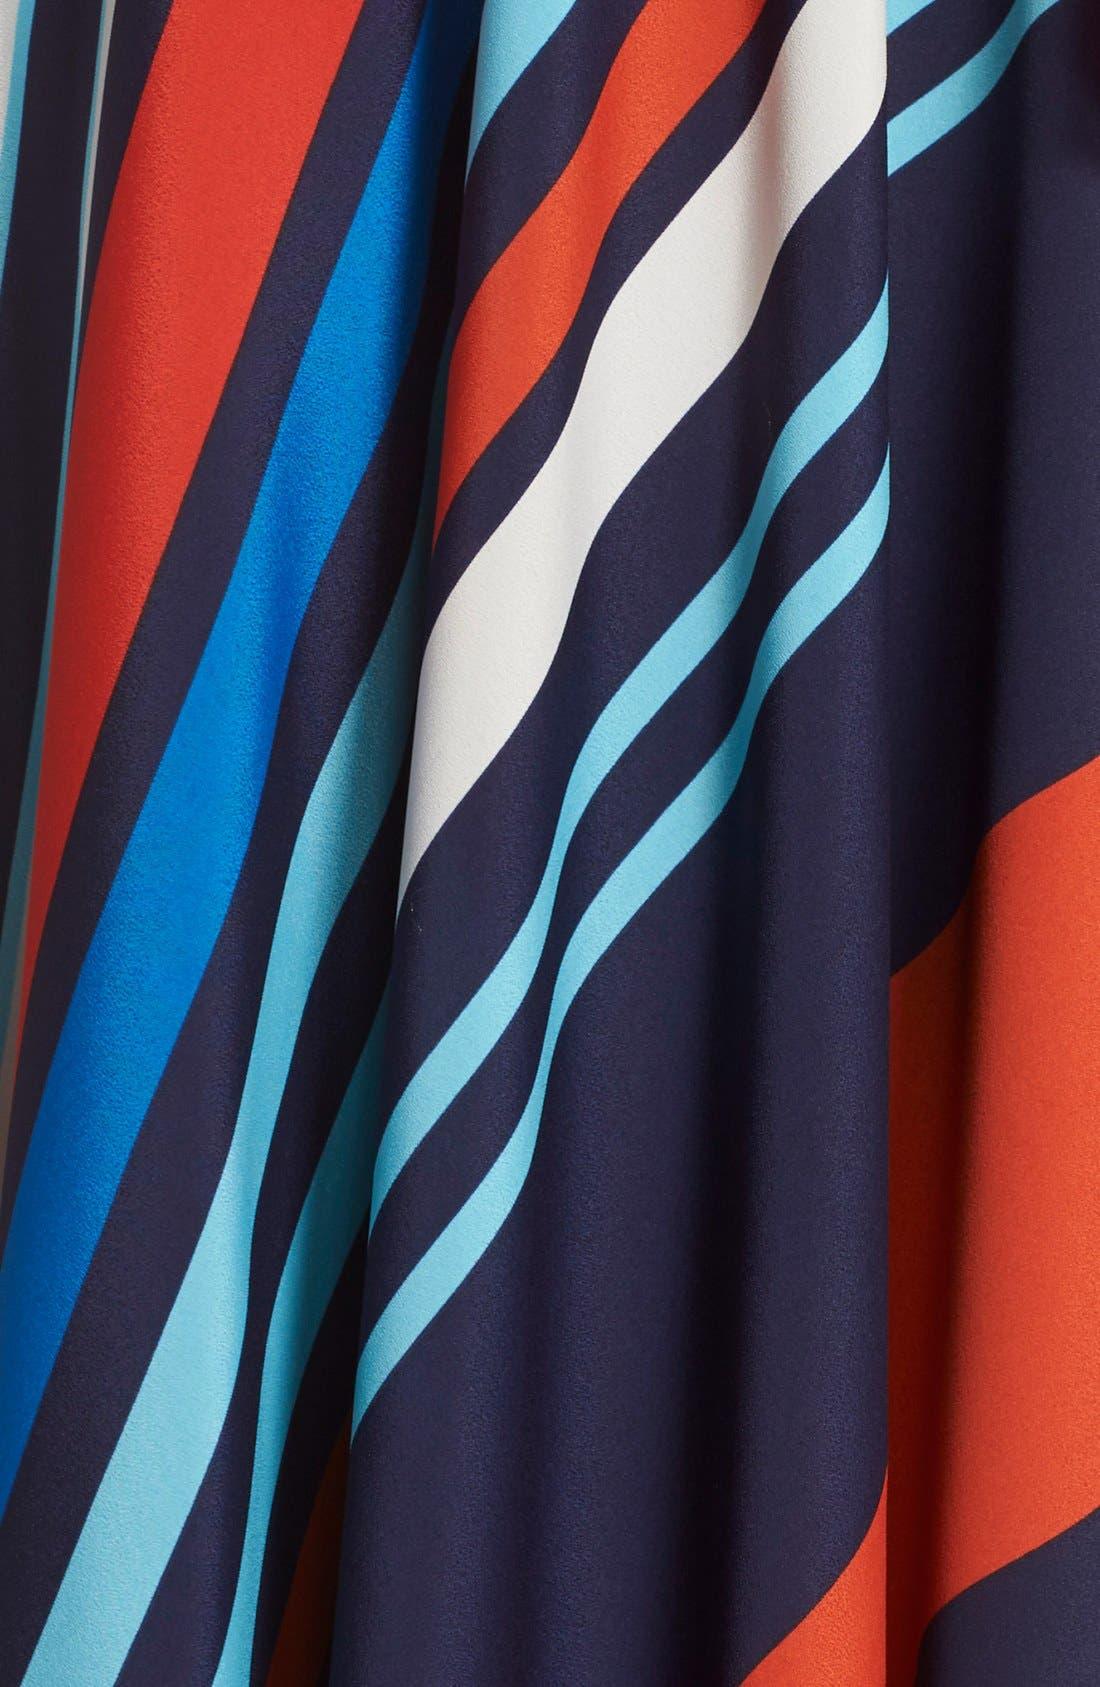 Jersey & Stripe Maxi Dress,                             Alternate thumbnail 7, color,